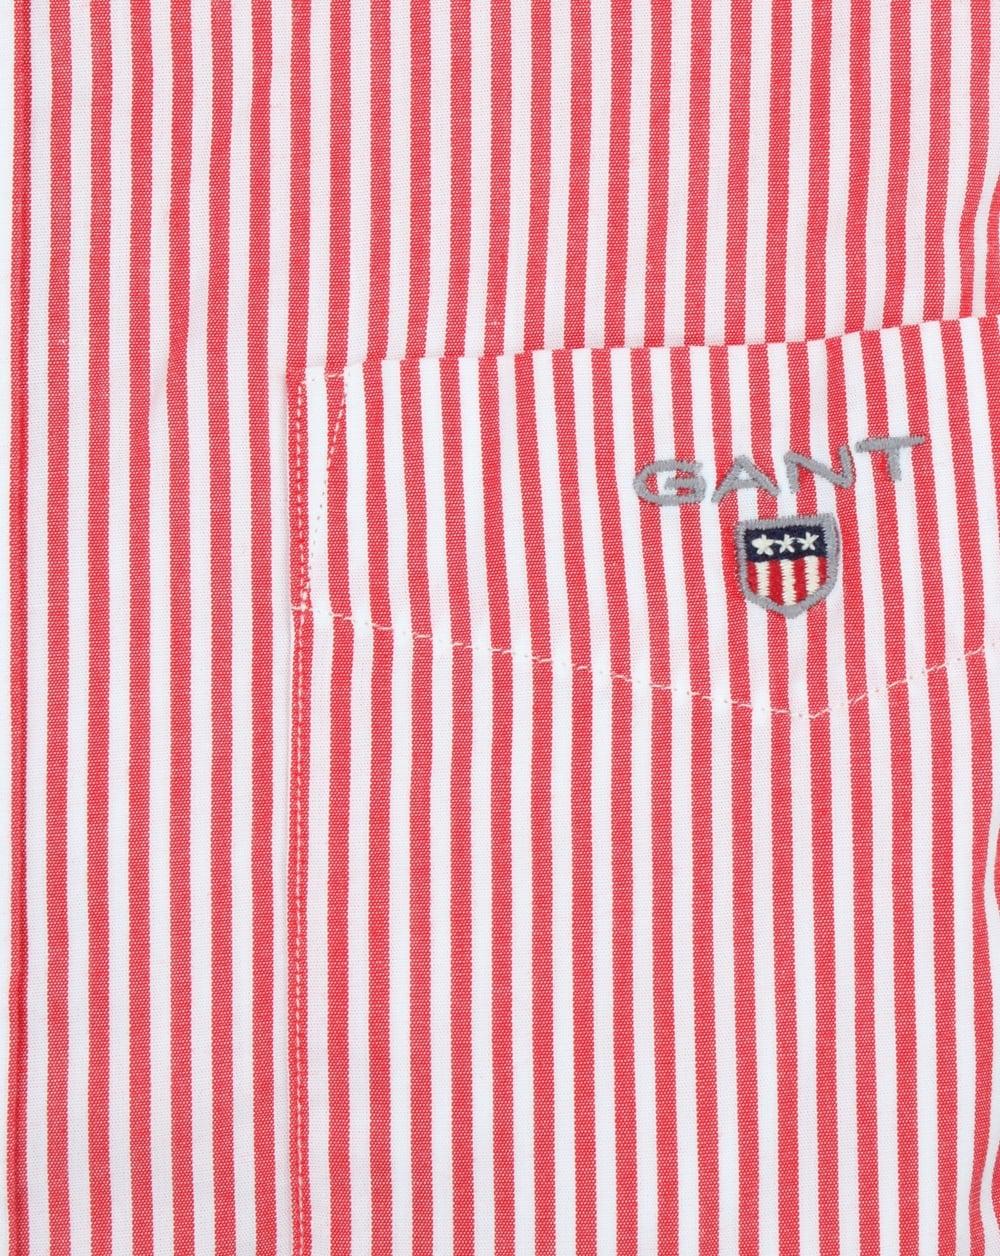 70aee971dd Gant Poplin Banker Striped Shirt Bright Red | 80s casual classics